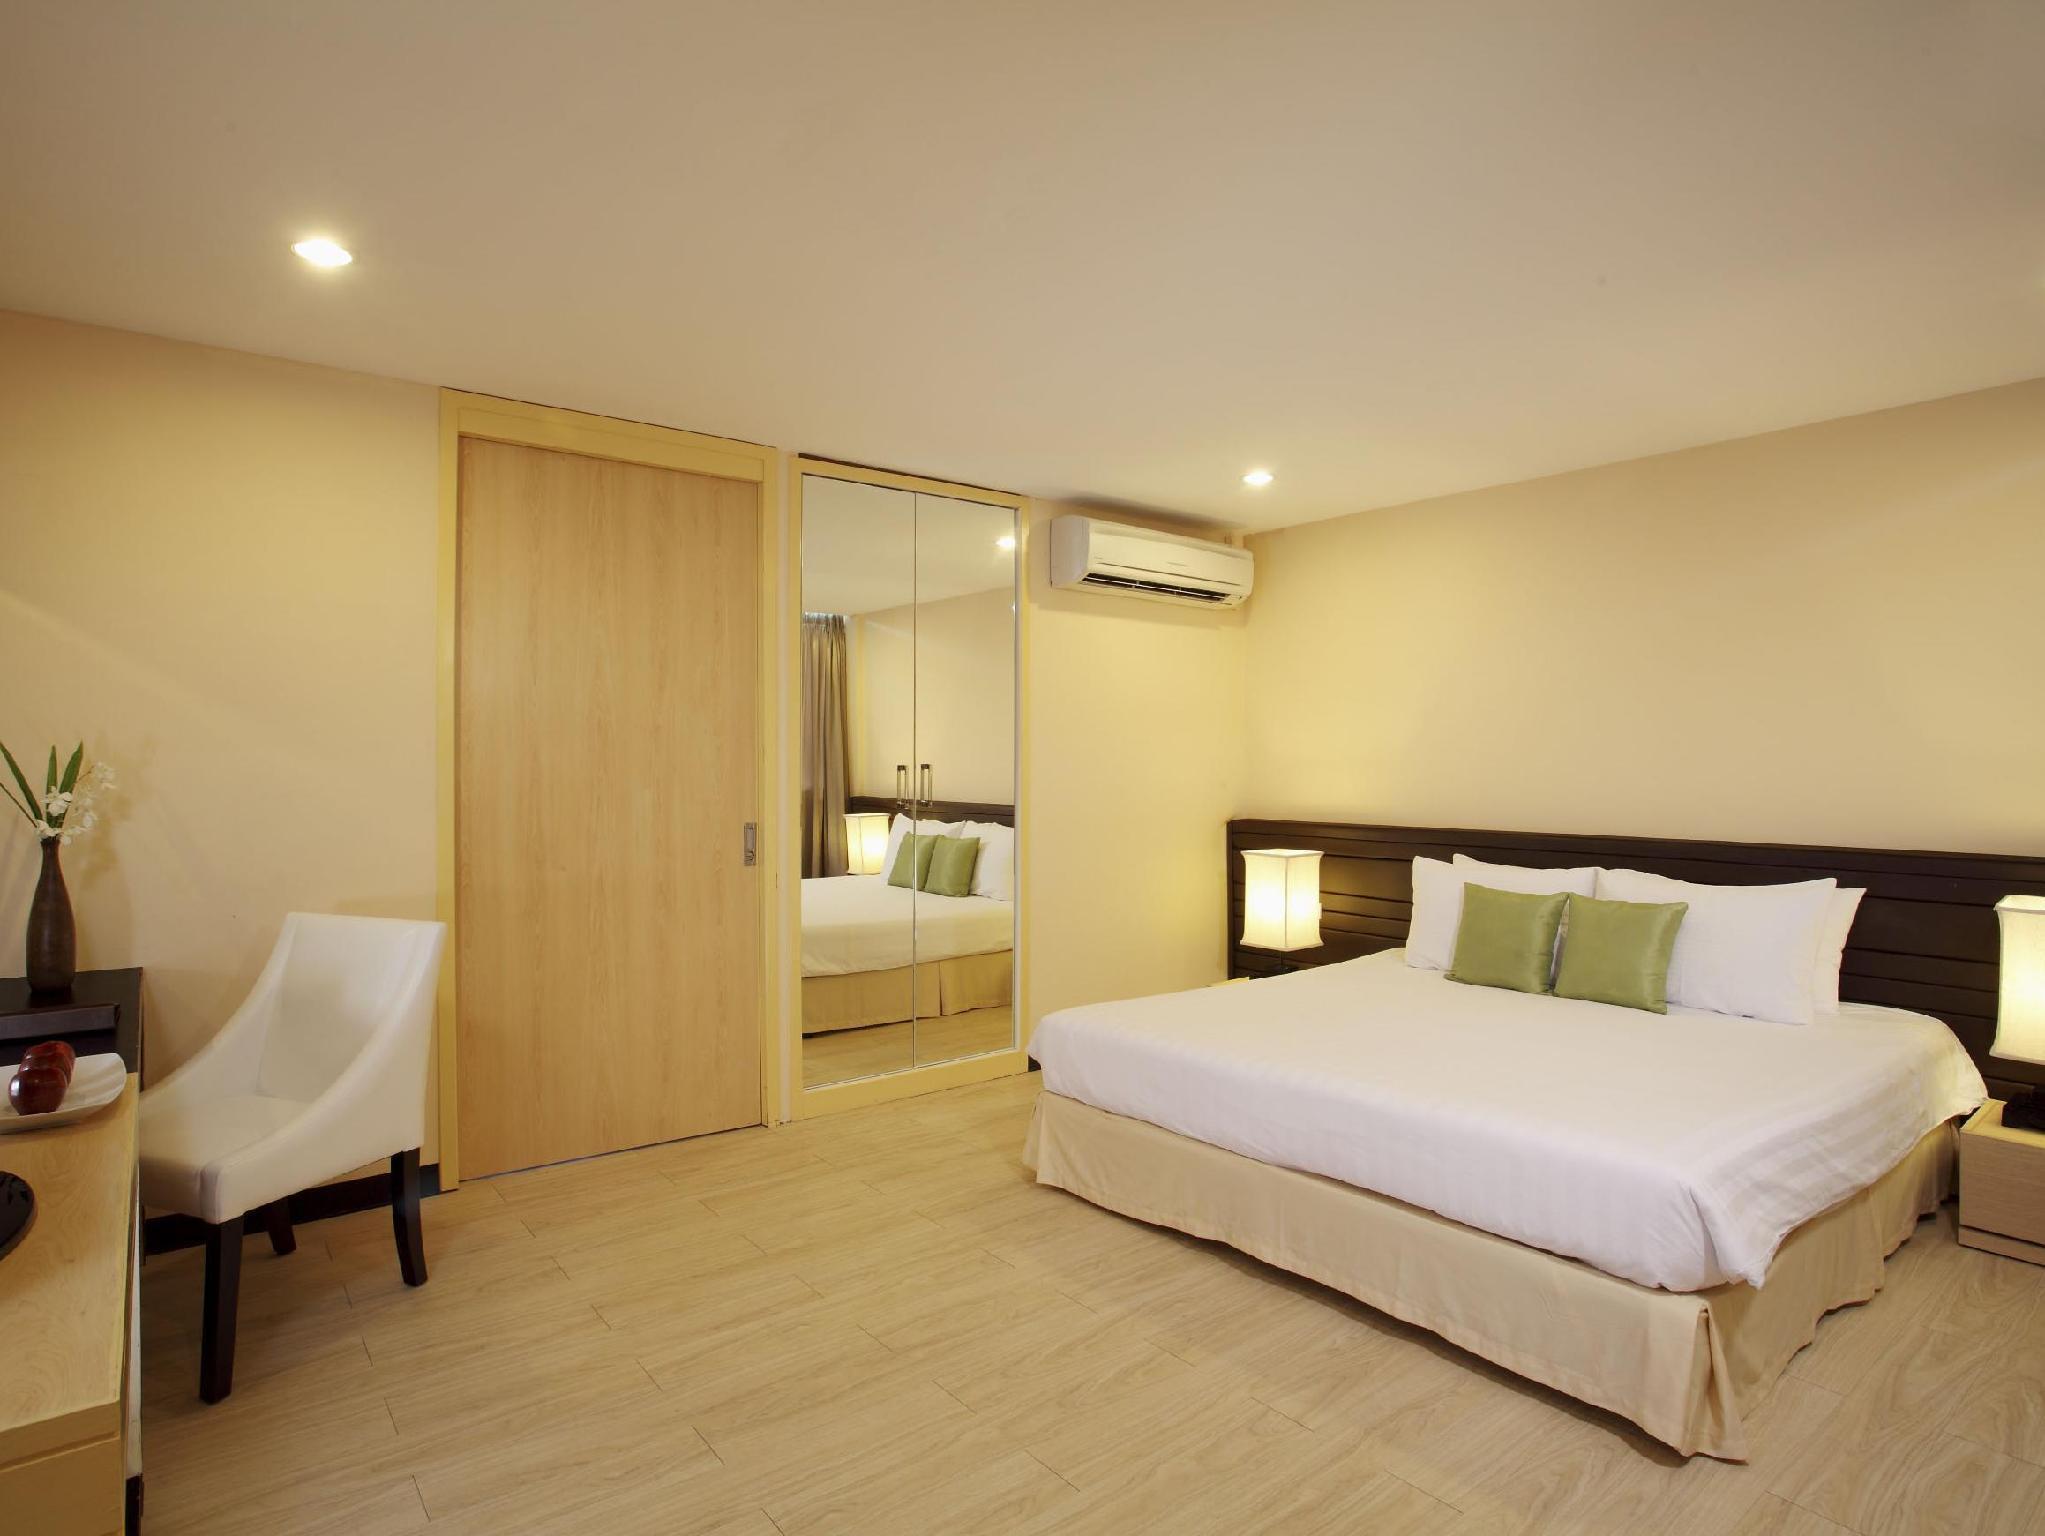 Seaview Resort Khao Lak ซีวิว รีสอร์ต เขาหลัก